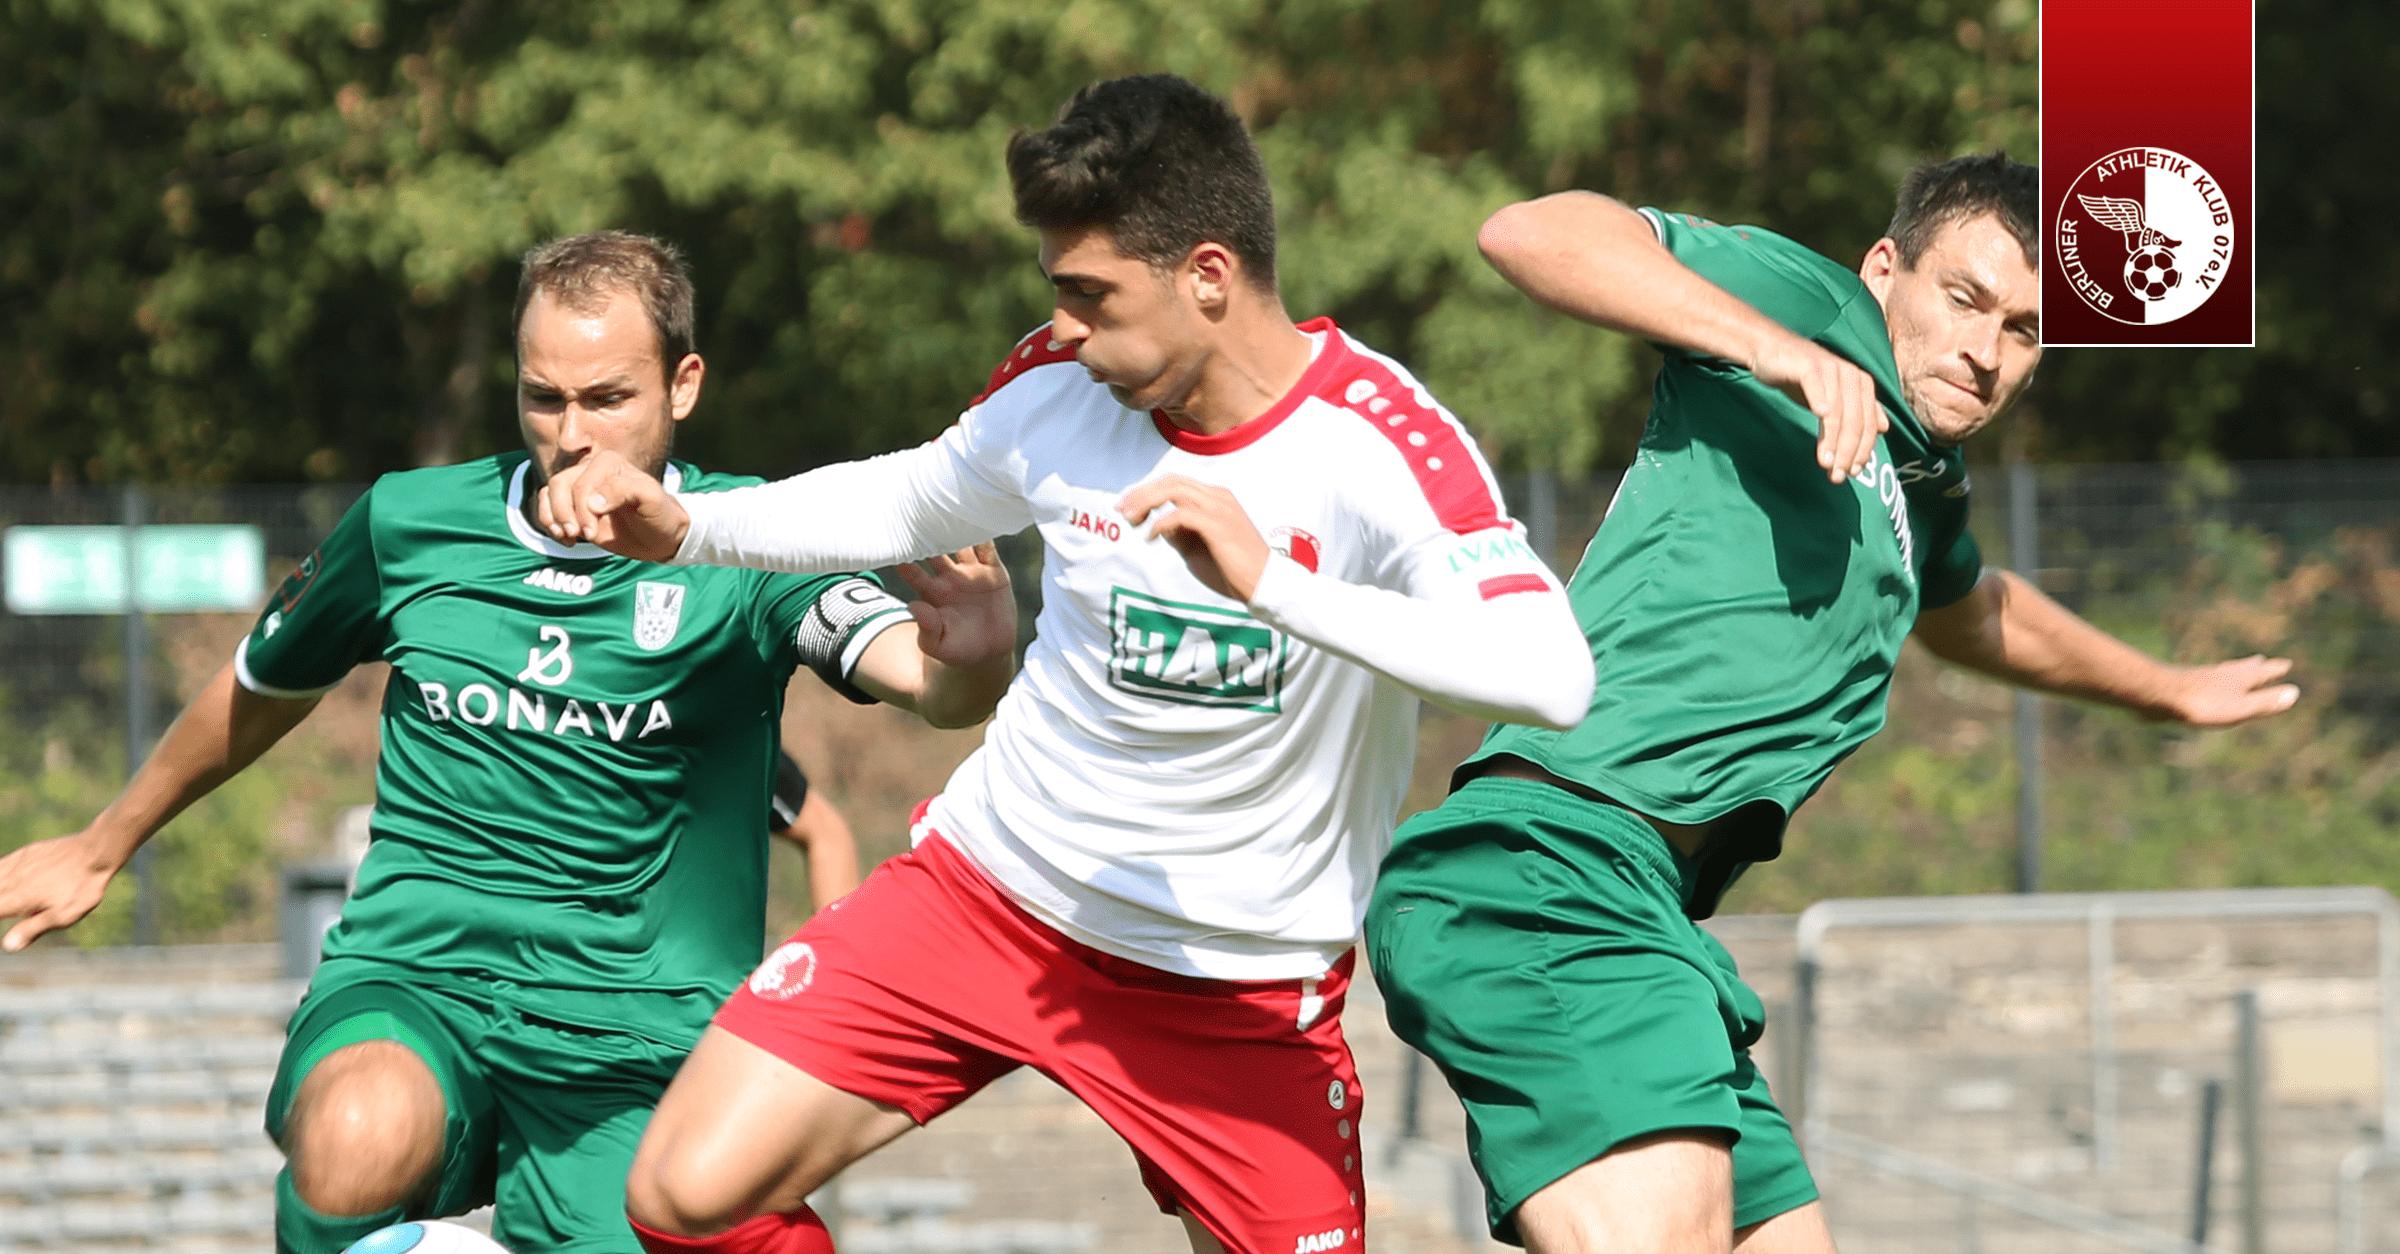 BAK vs. Fürstenwalde 1-4-min